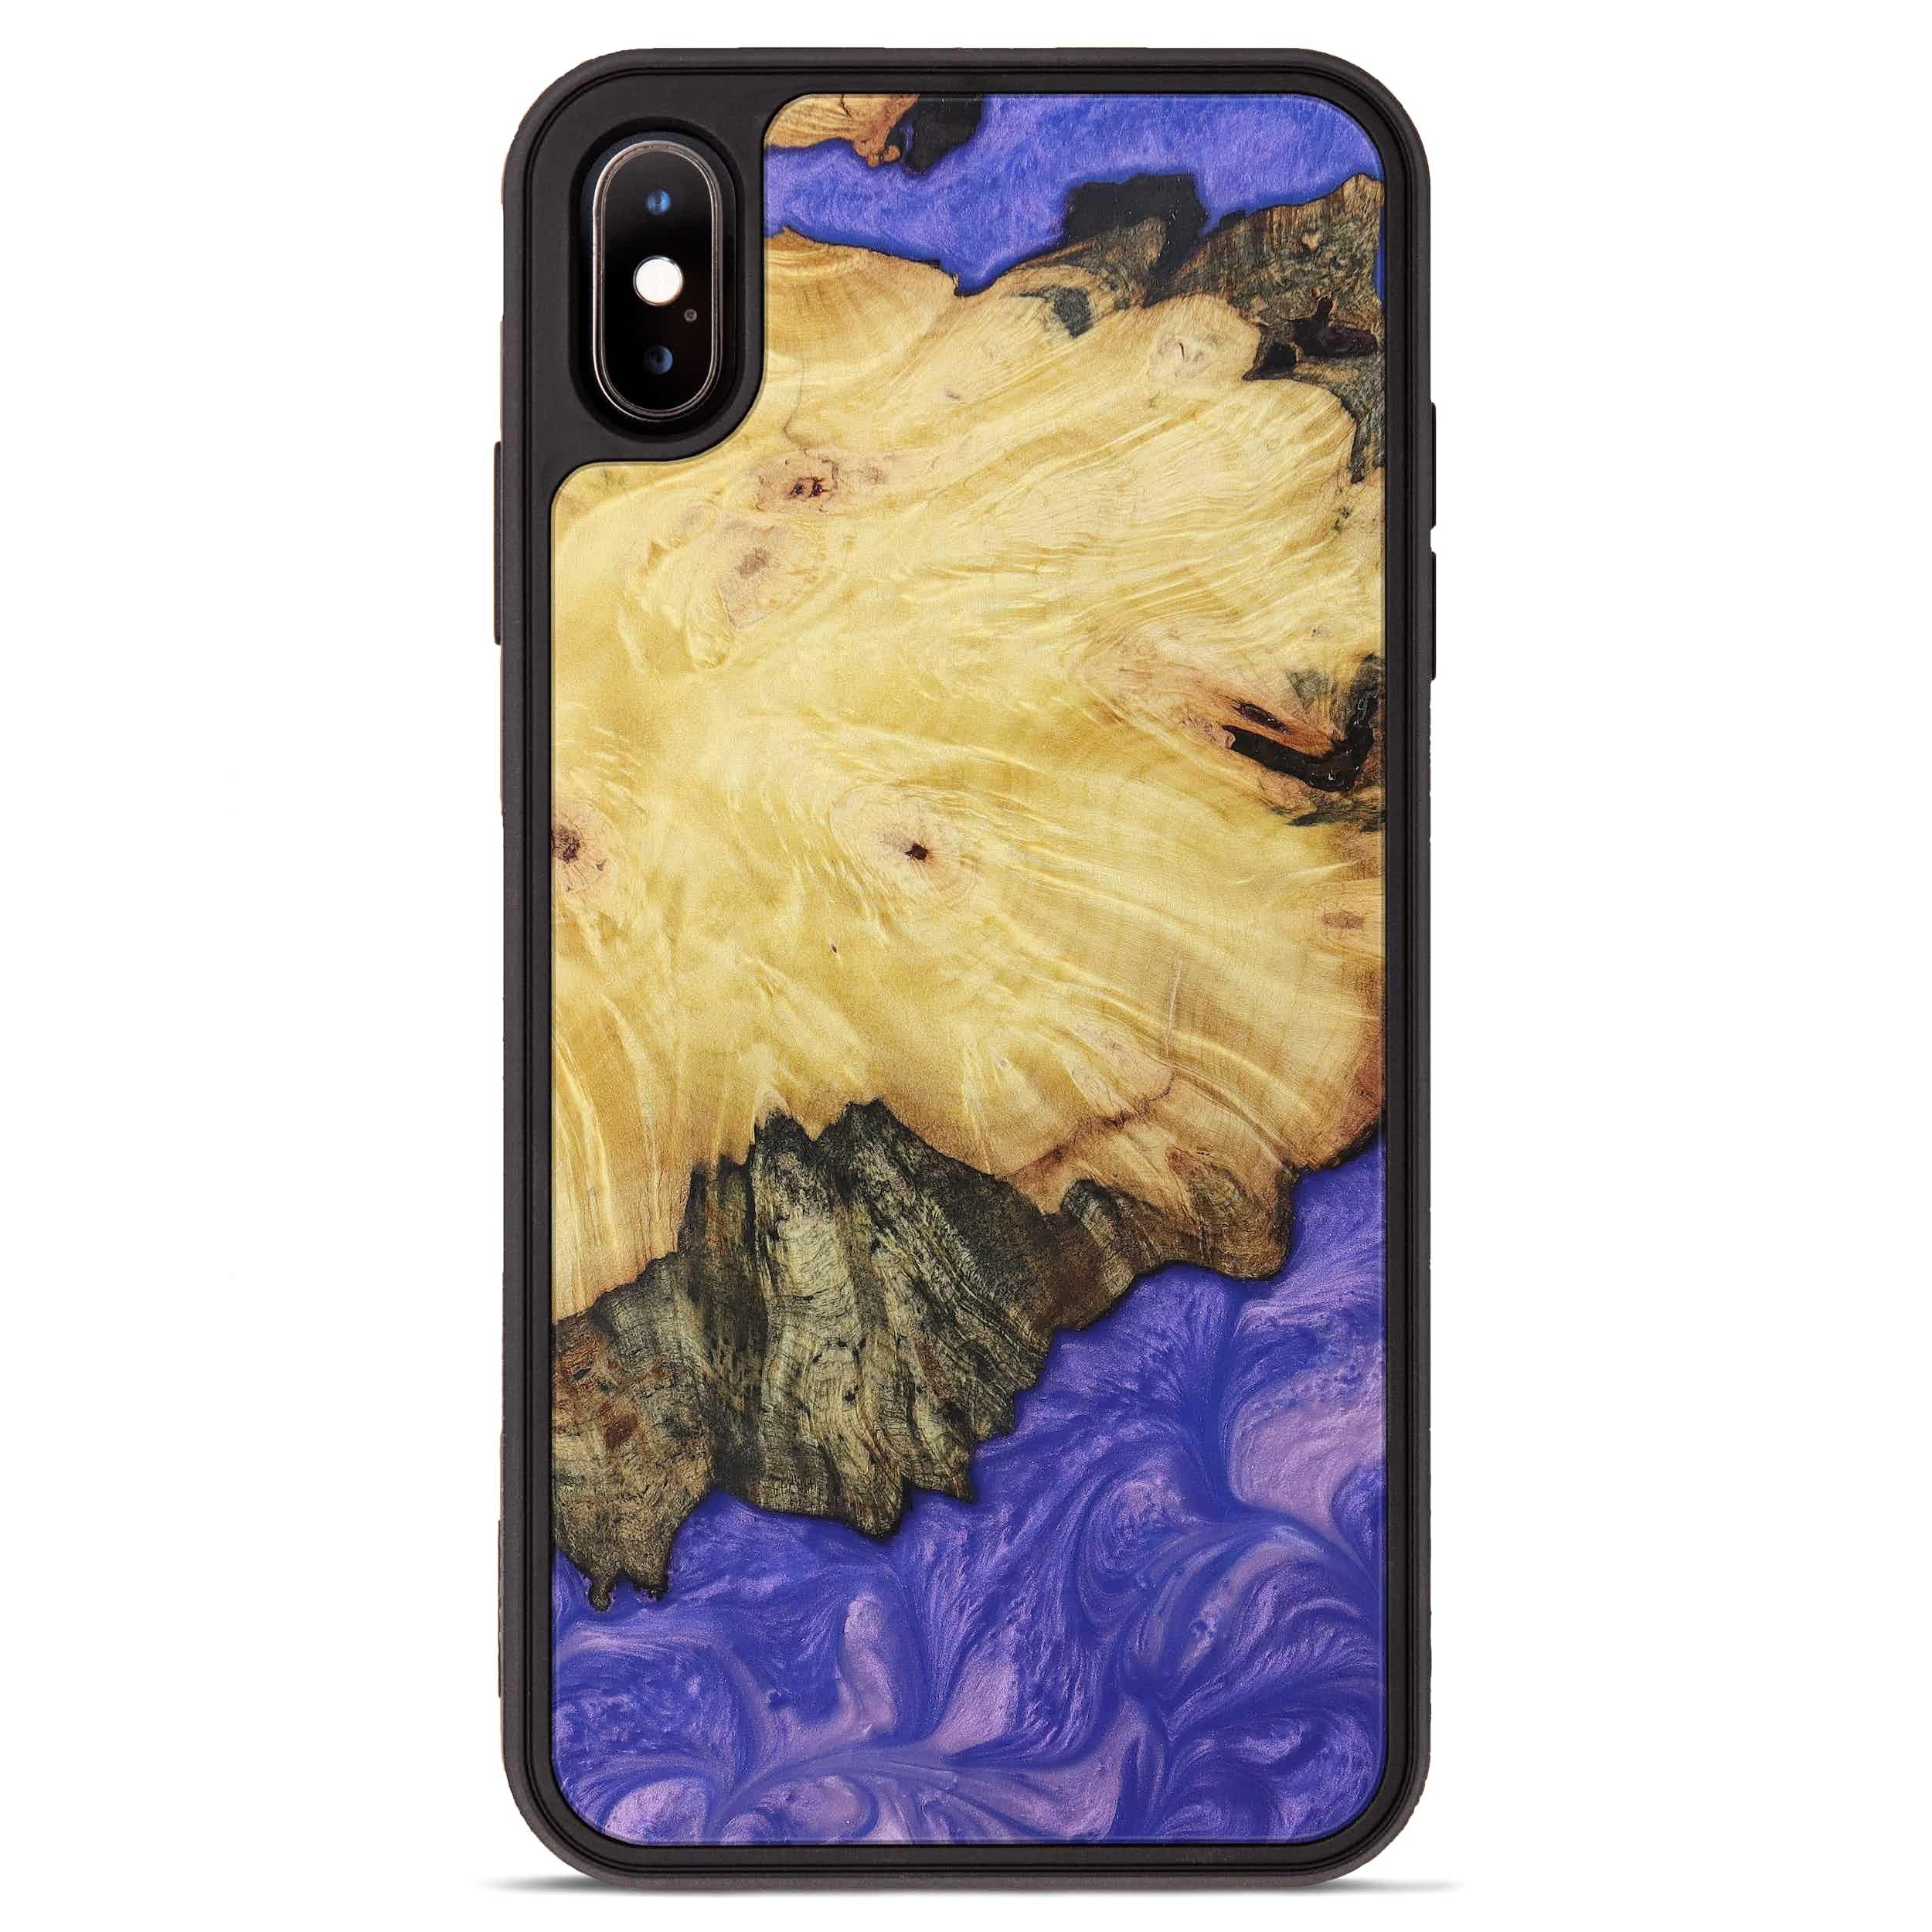 iPhone Xs Max Wood+Resin Phone Case - Cathe (Purple, 395918)